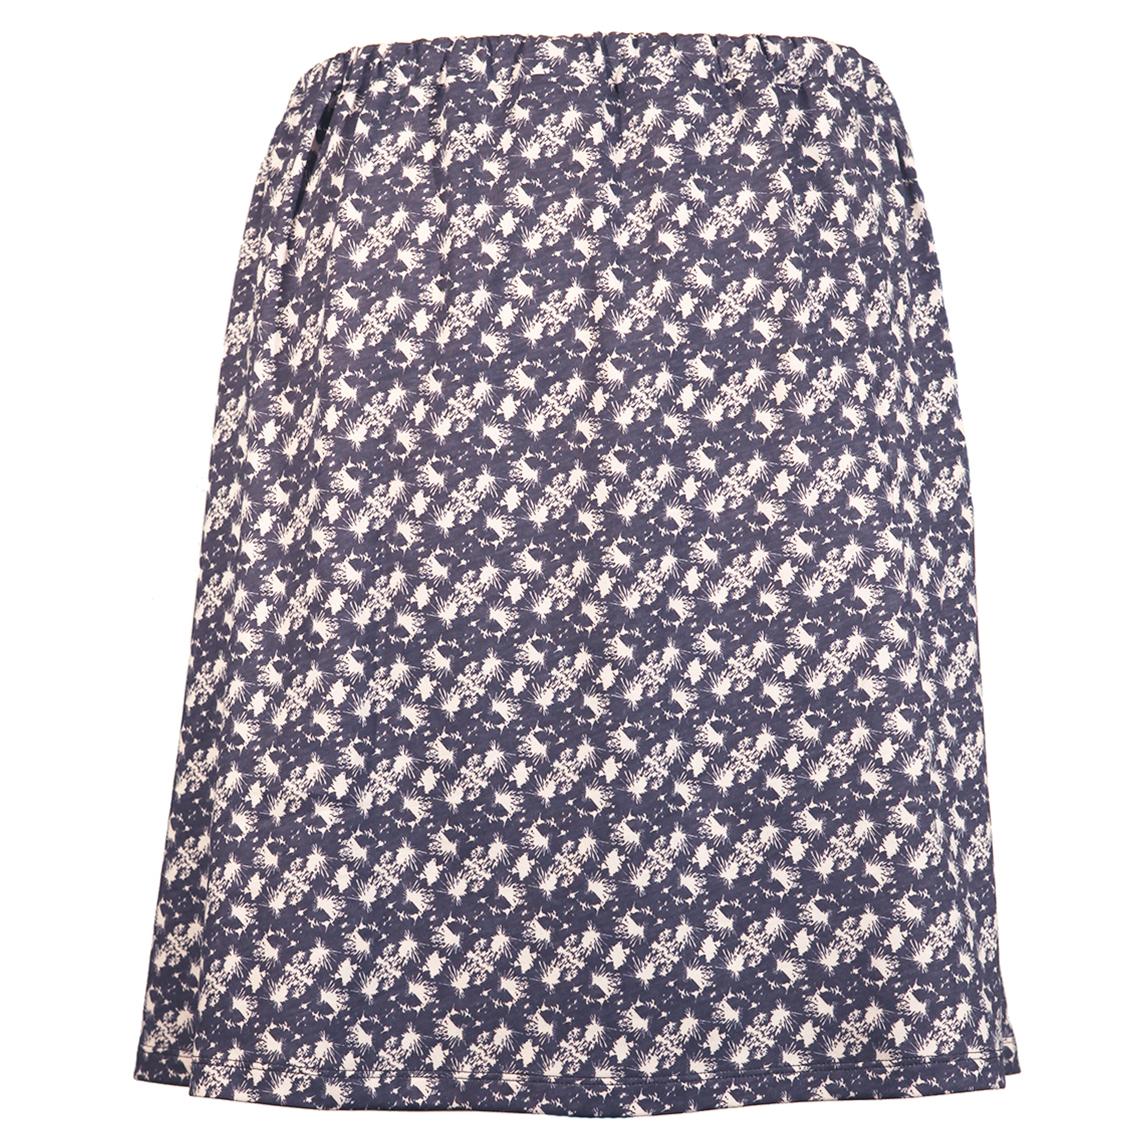 Printet nederdel med elastik i taljen